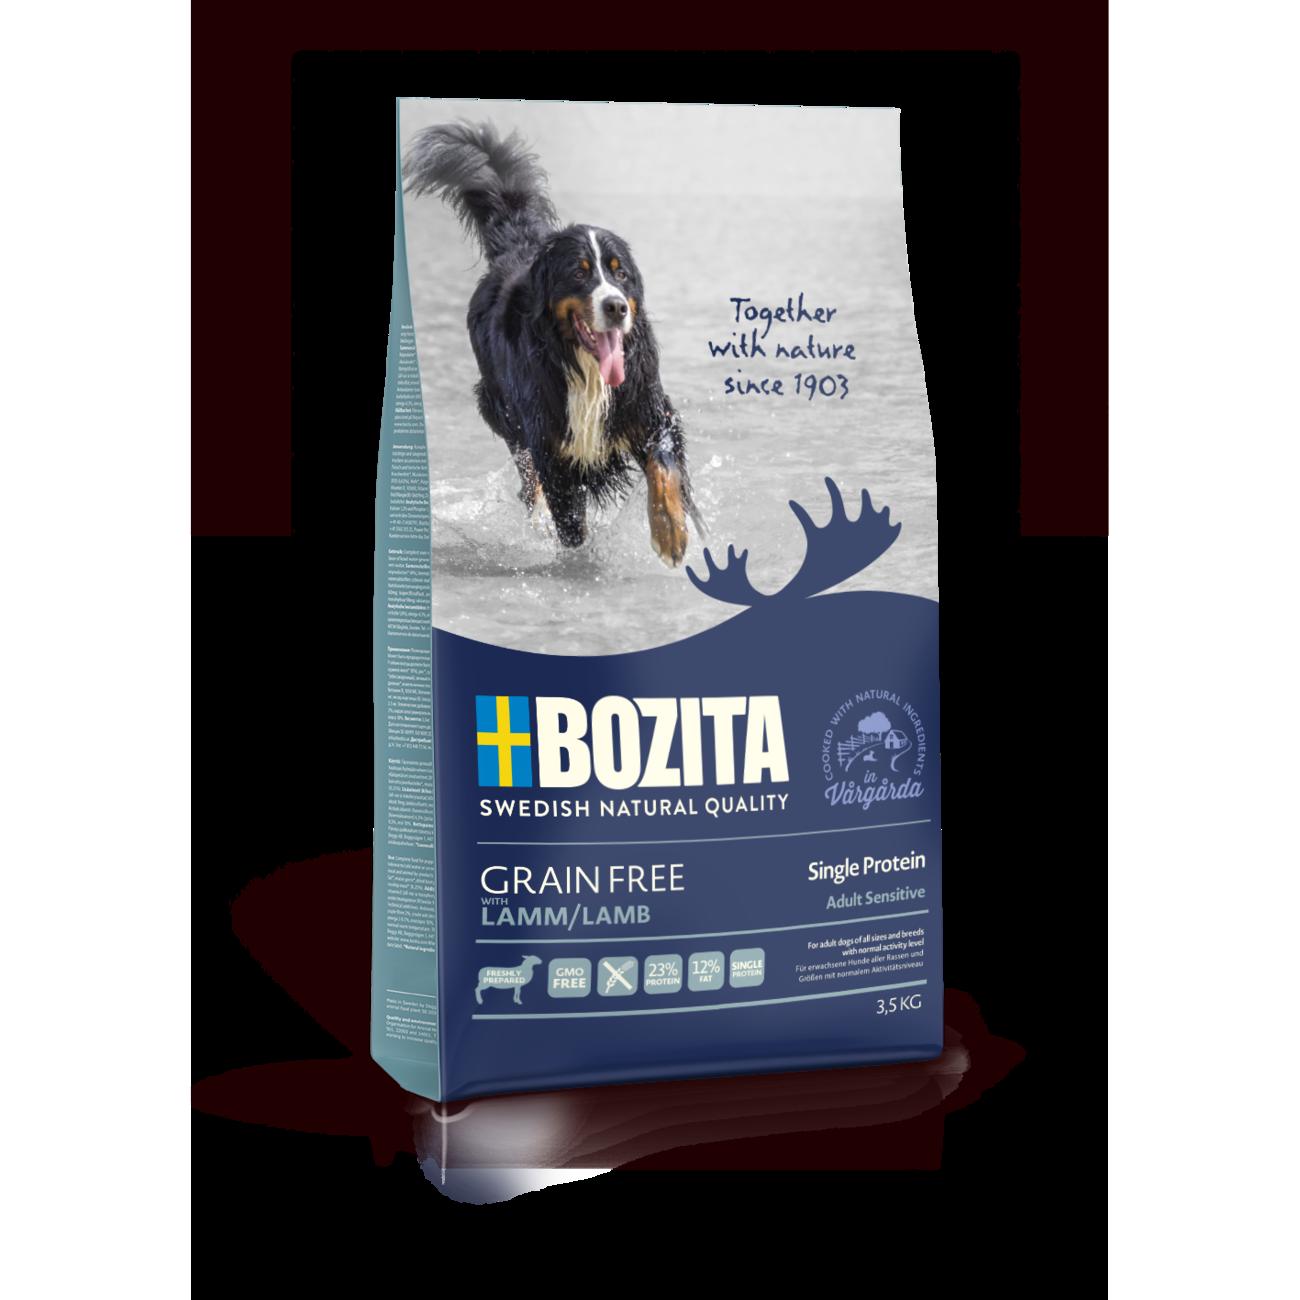 Bozita Hundefutter Grain Free Lamm, Bild 2